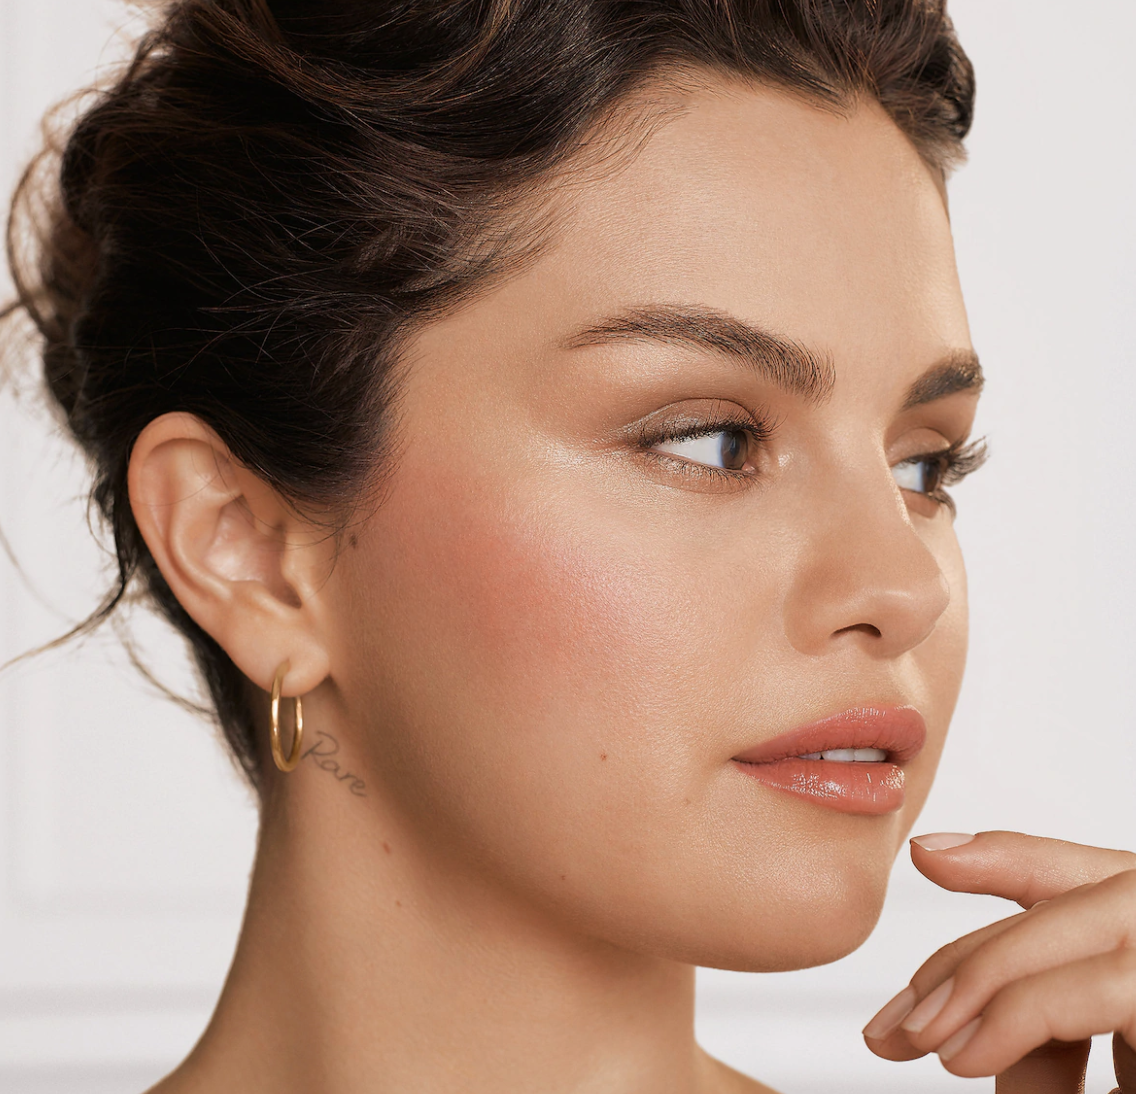 Selena Gomez wearing Positive Light Liquid Luminizer Highlight in radiant finish shade